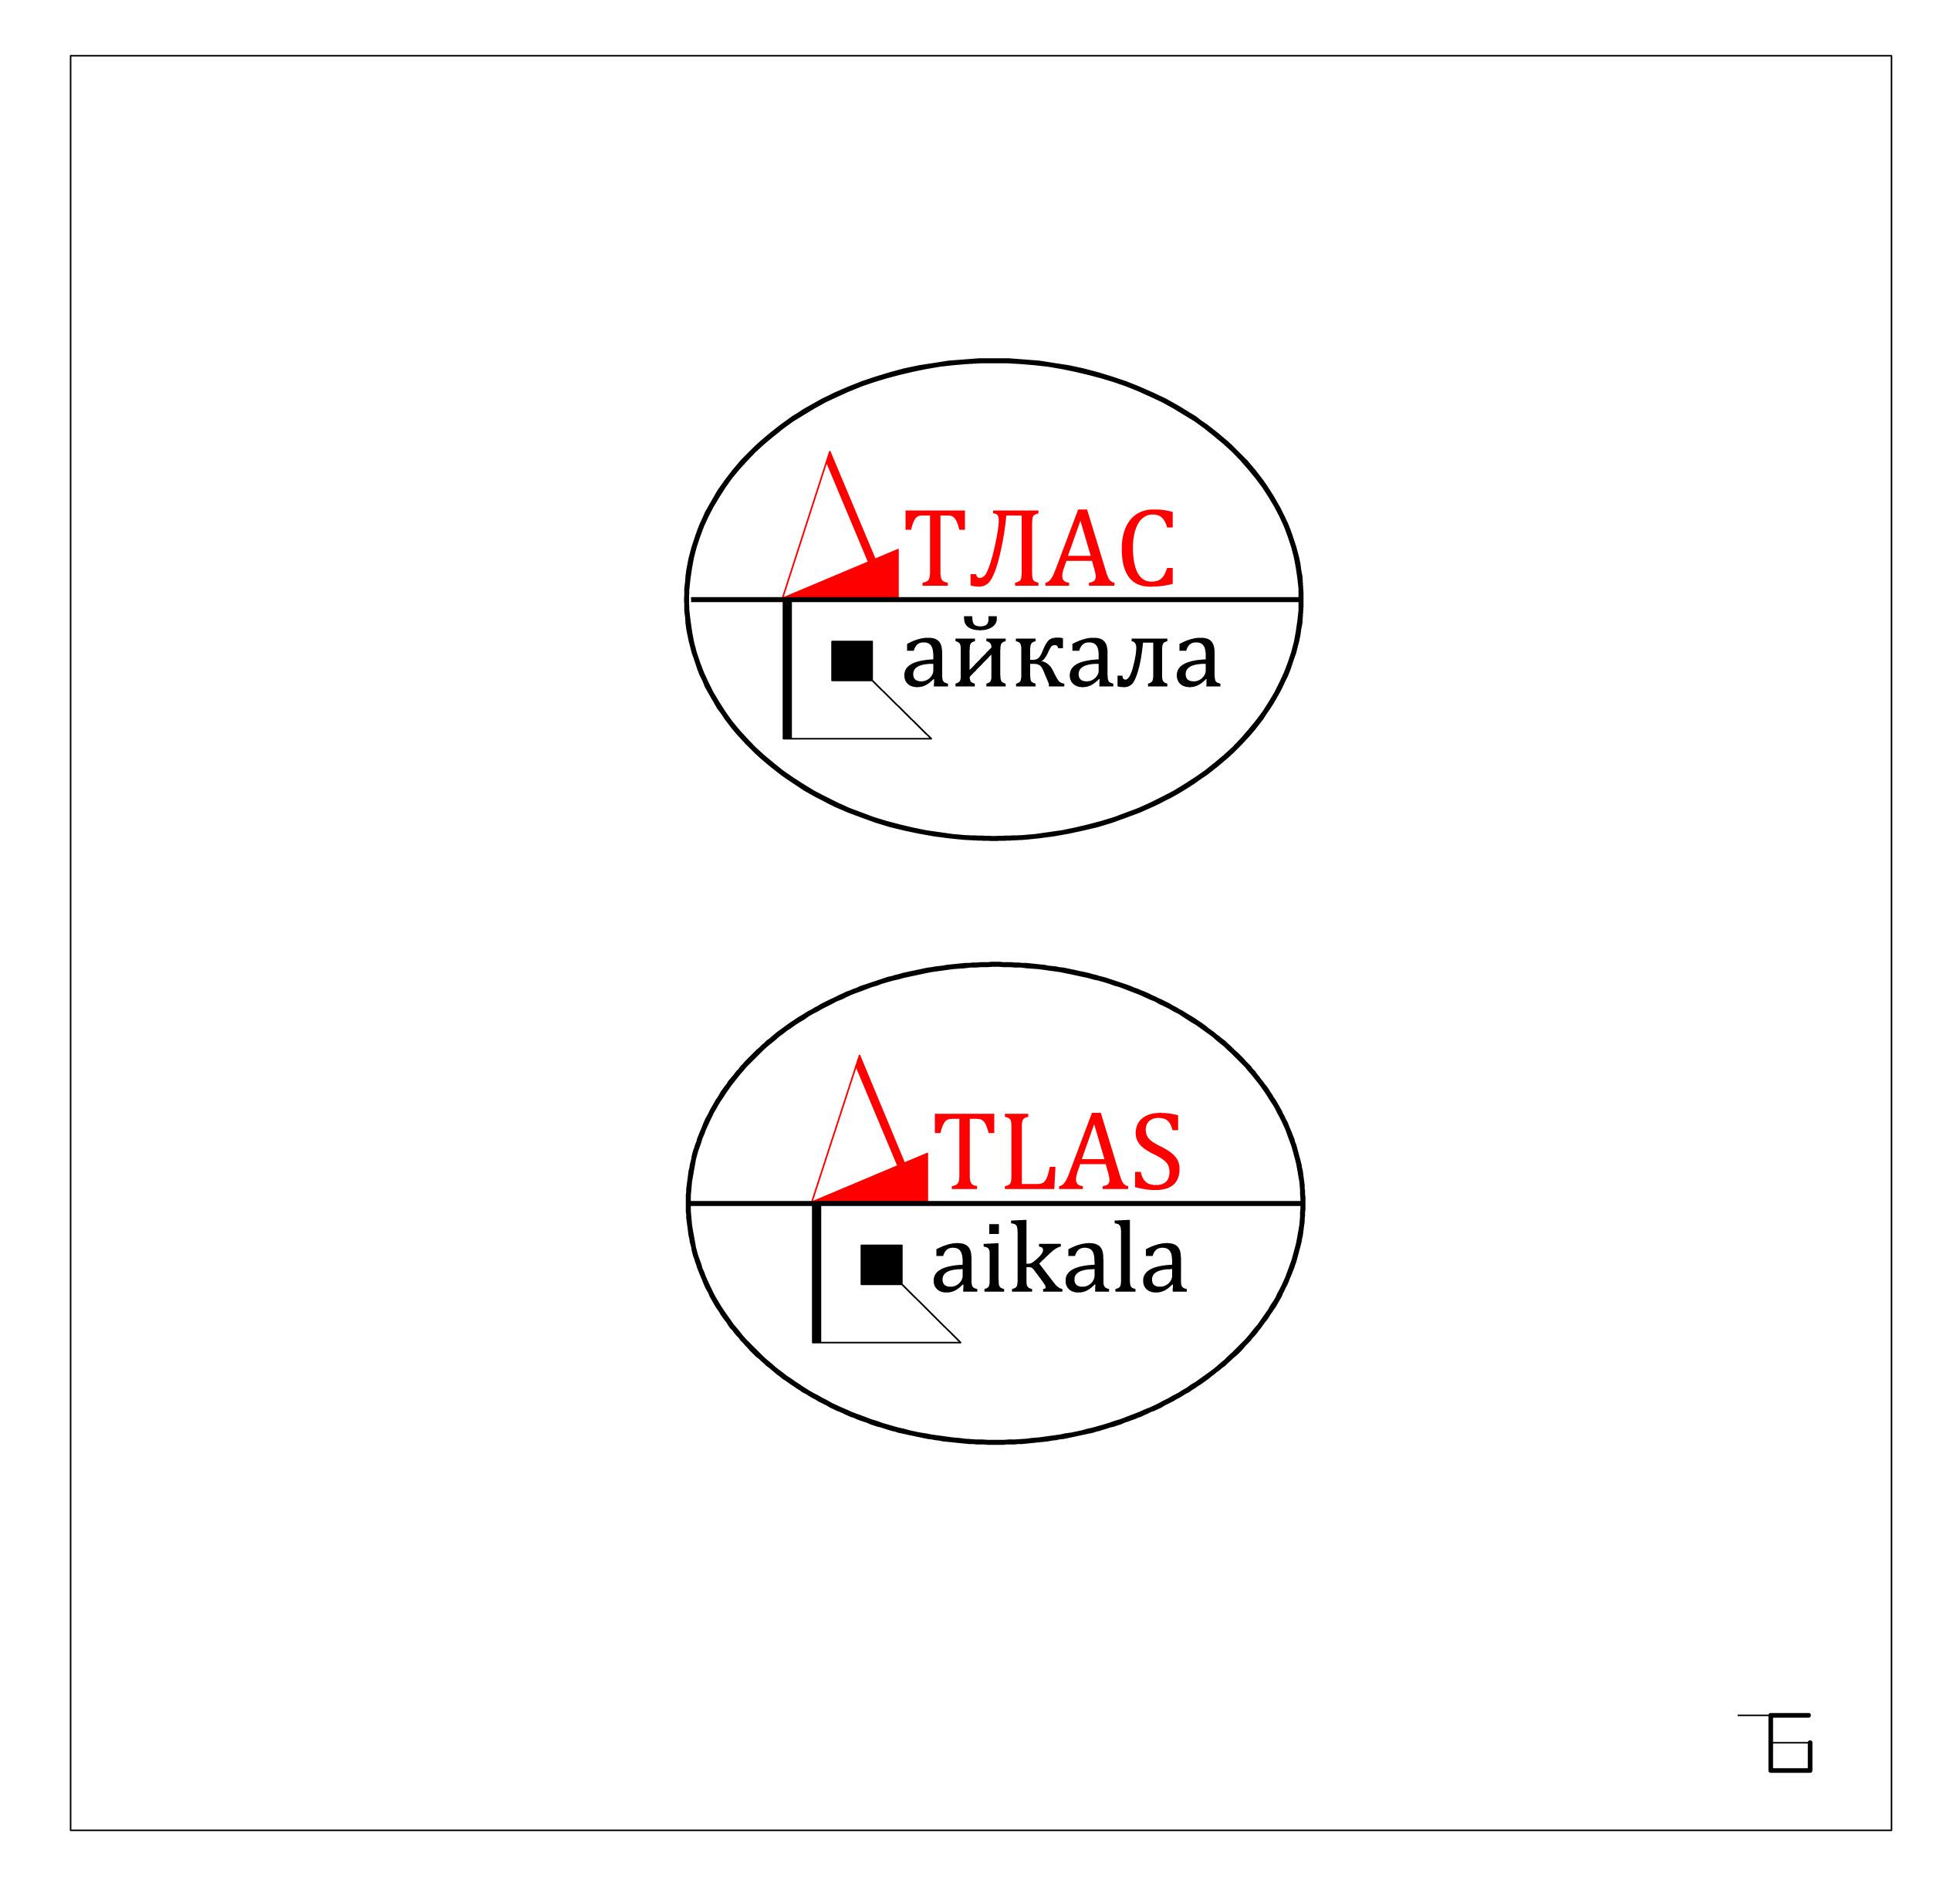 Разработка логотипа Атлас Байкала фото f_8455b0f0f8e62855.jpg